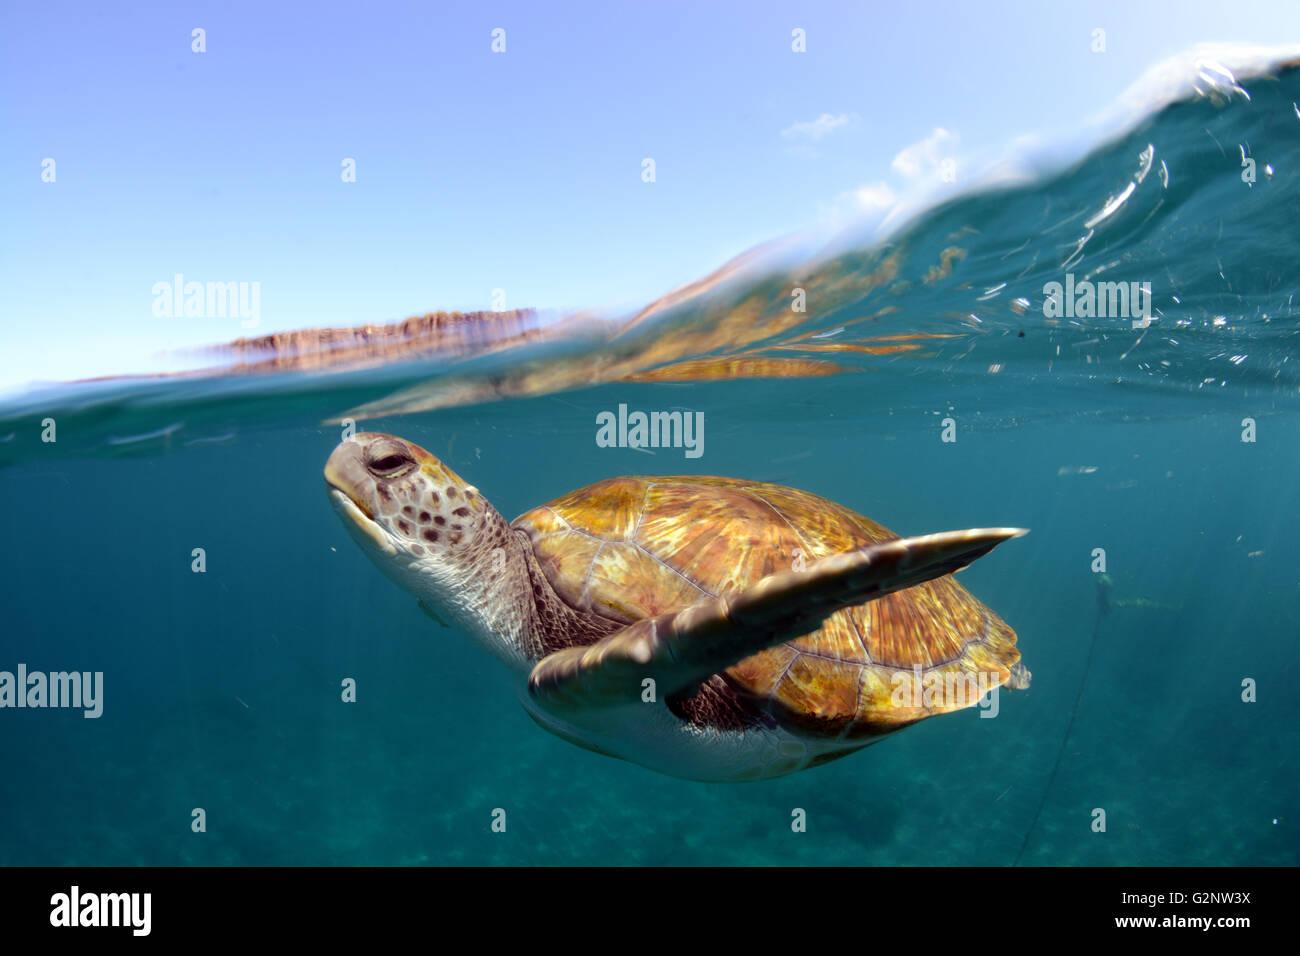 Sous l'eau des tortues vertes à El Puertito, Costa Adeje, Tenerife Banque D'Images